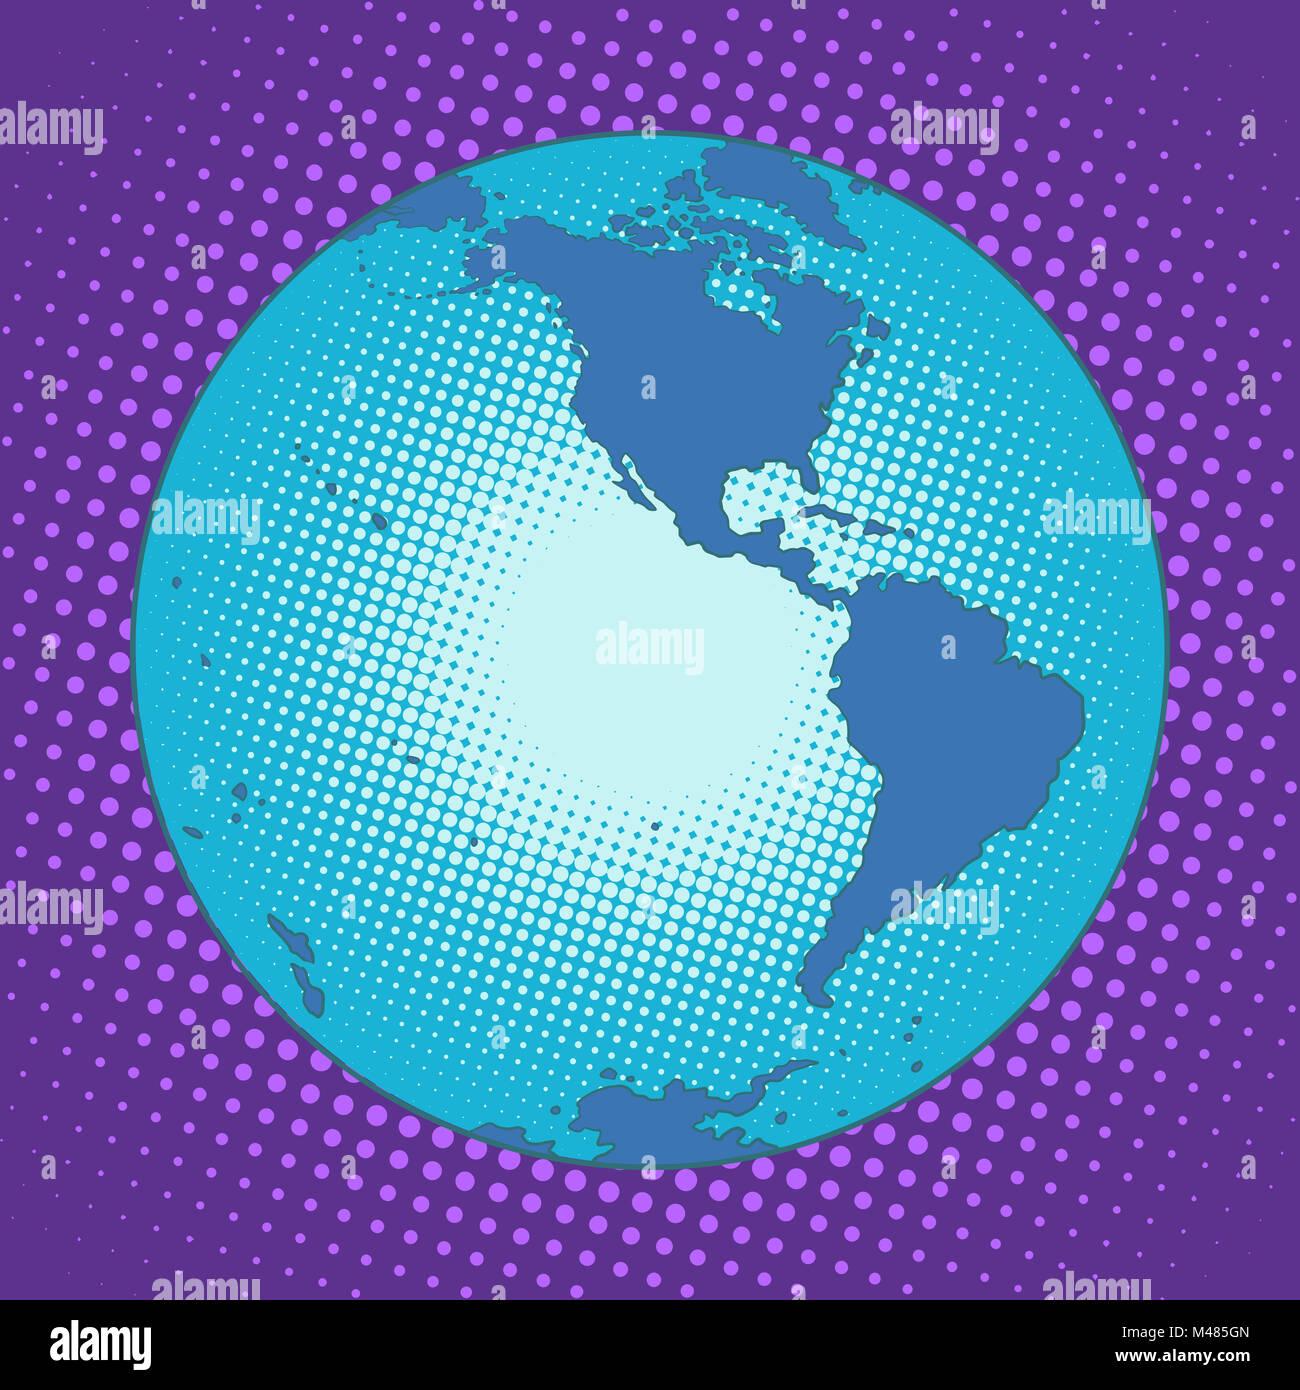 Planet Earth Western hemisphere - Stock Image